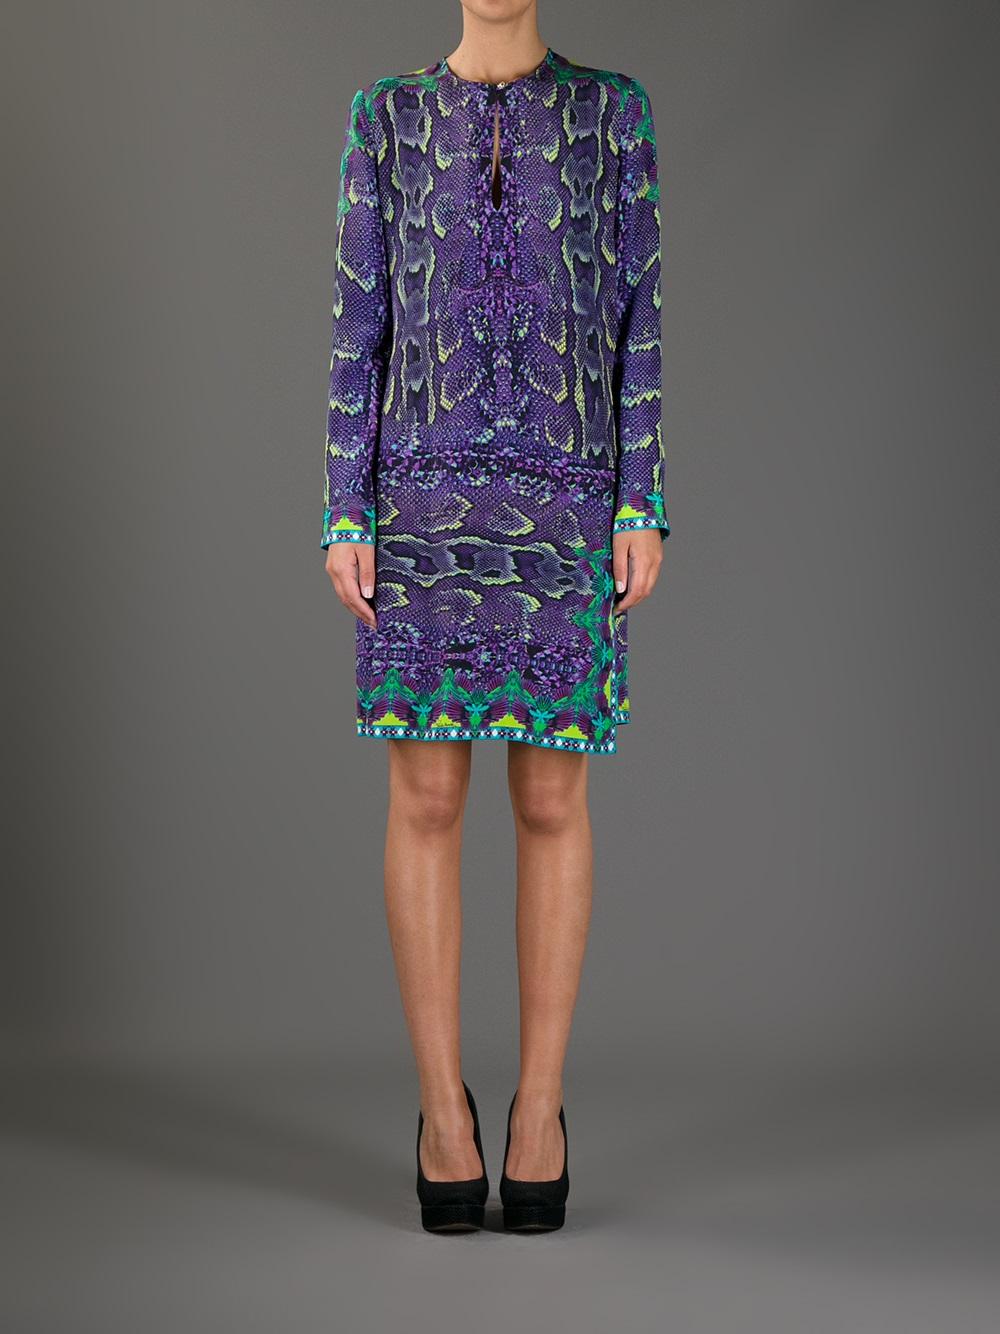 Roberto Cavalli Snakeskin Print Dress In Purple Lyst